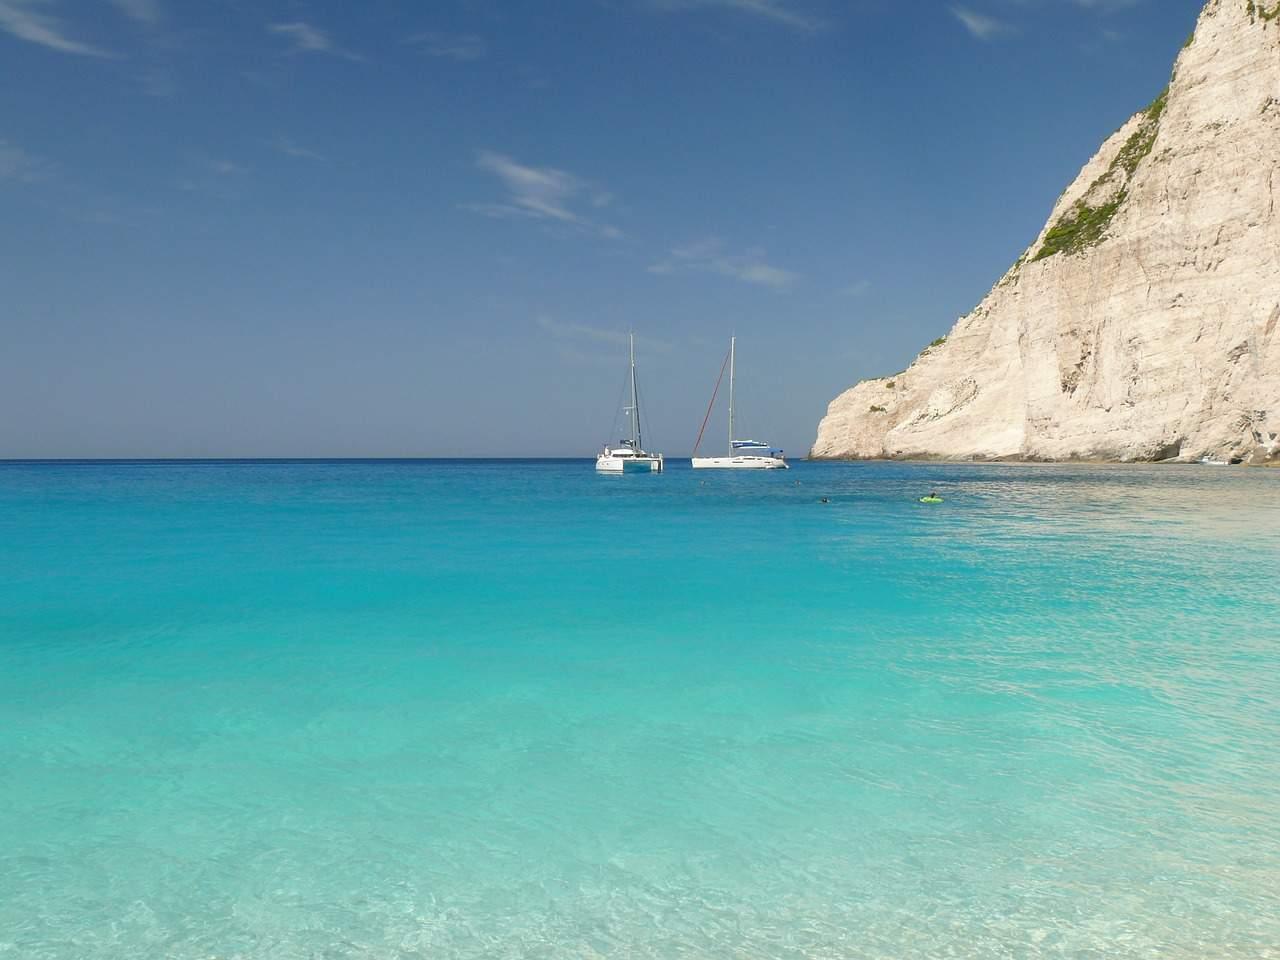 BAREBOAT CHARTER IN GREECE